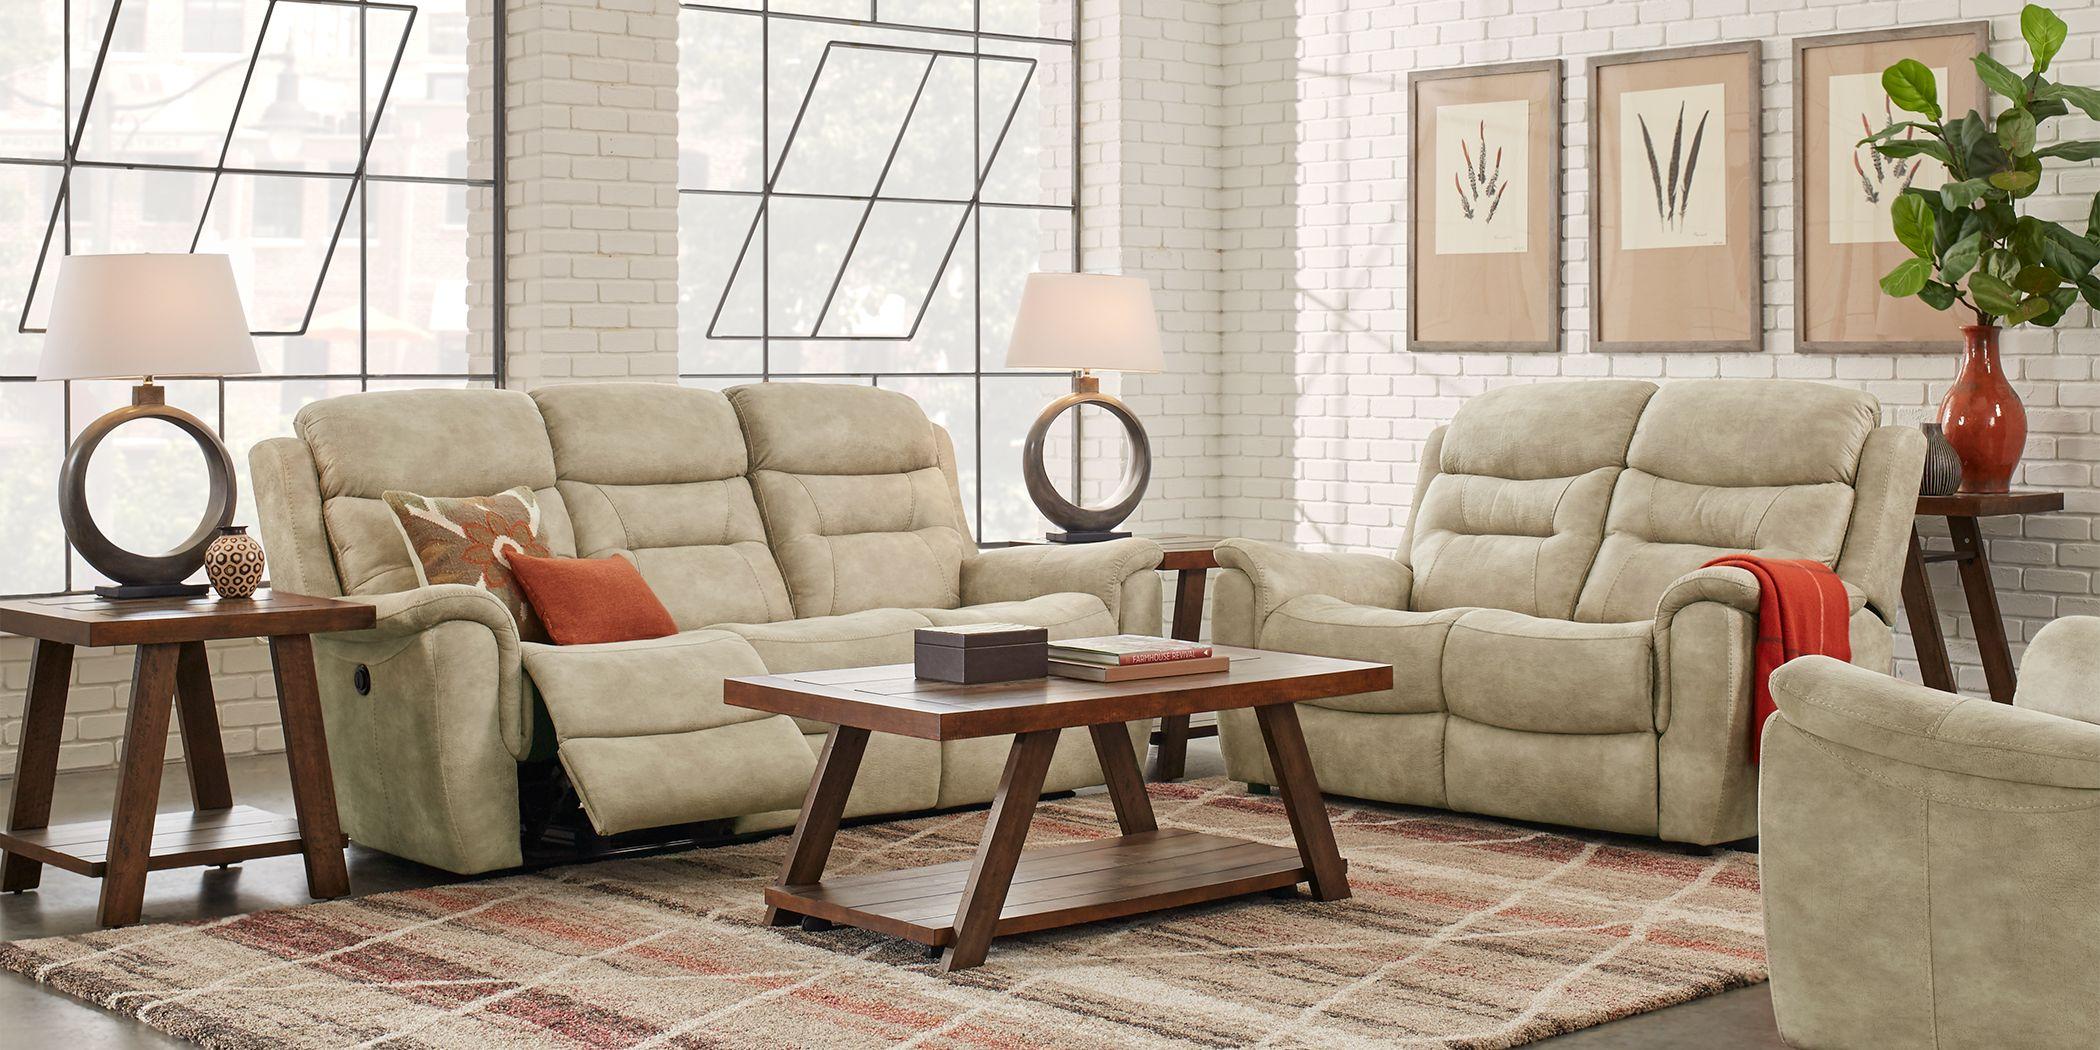 Halton Hills Sand 3 Pc Living Room with Reclining Sofa